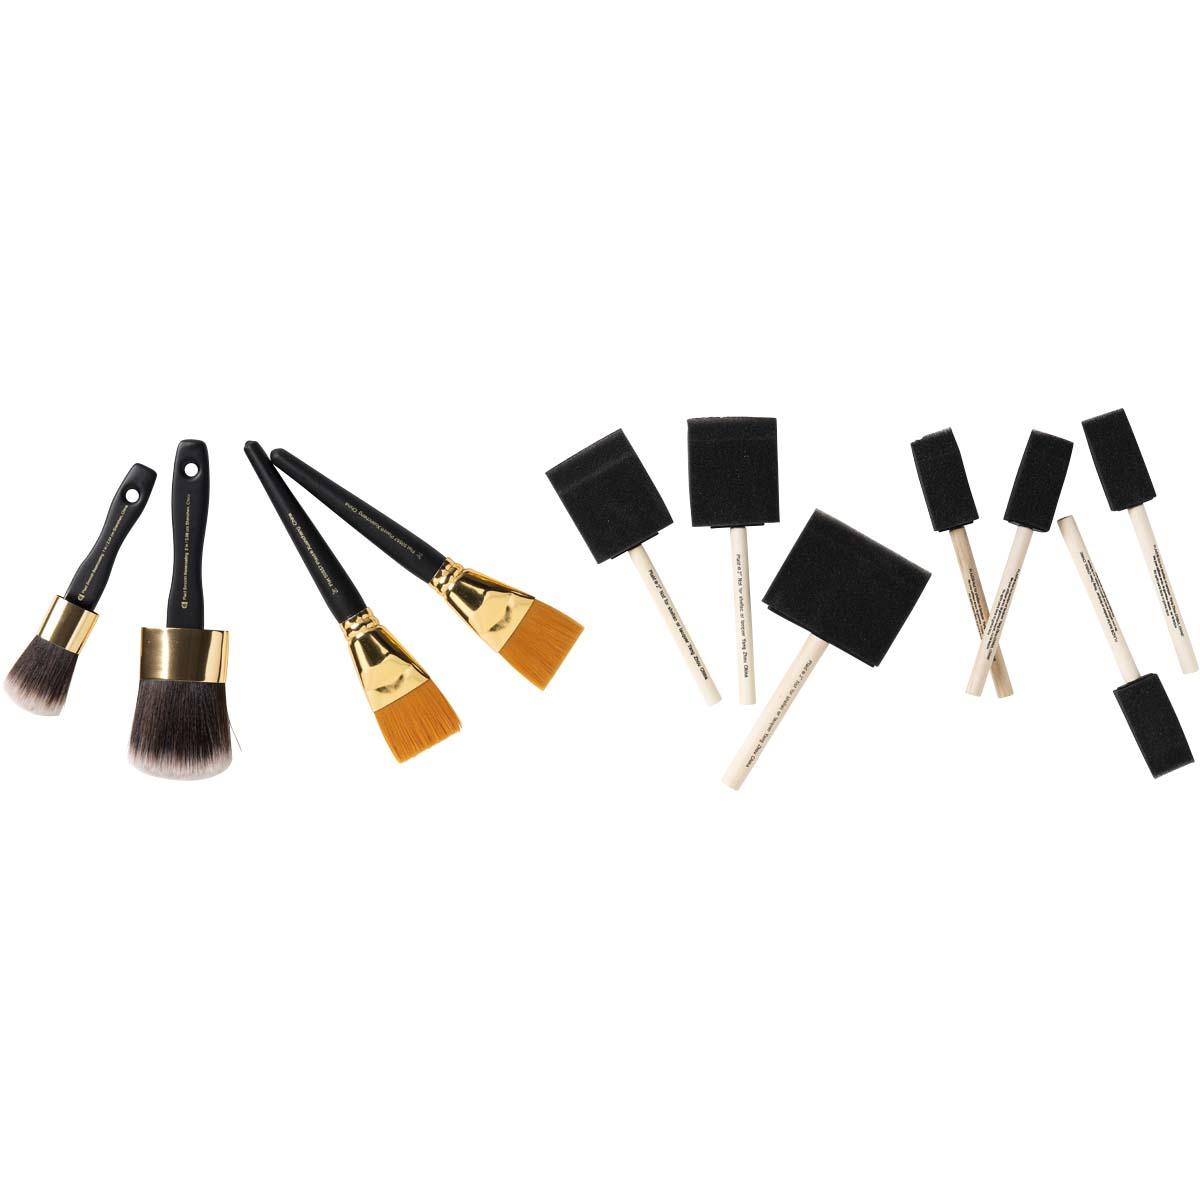 FolkArt ® One Stroke™ Brushes - Brush Sets - Basecoaters - 90196